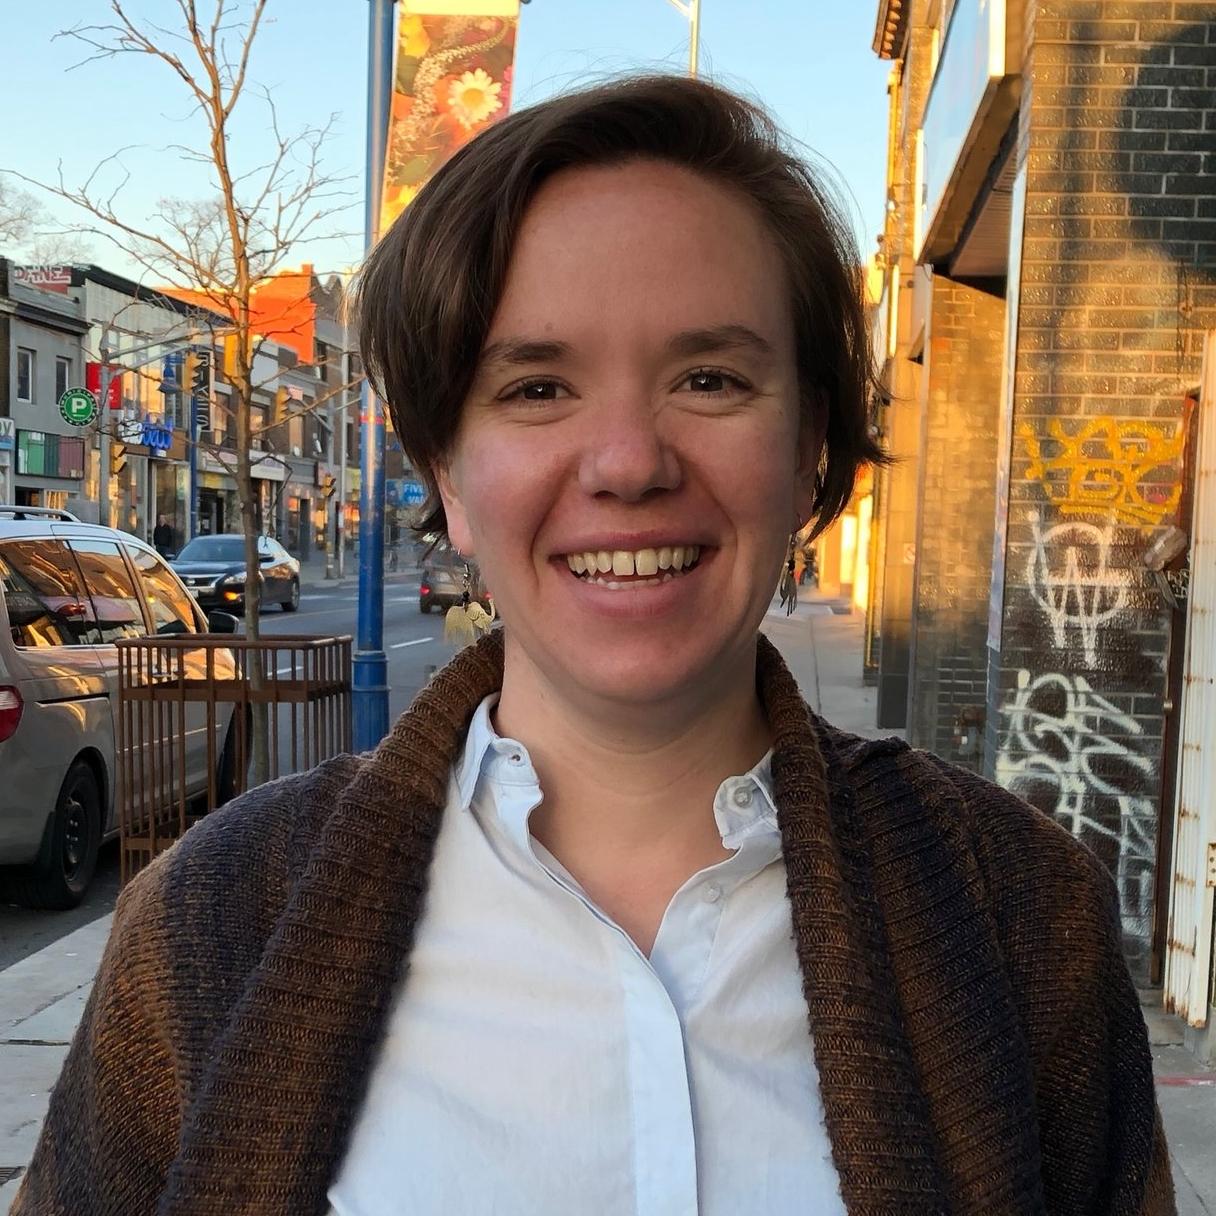 Esther Lexchin